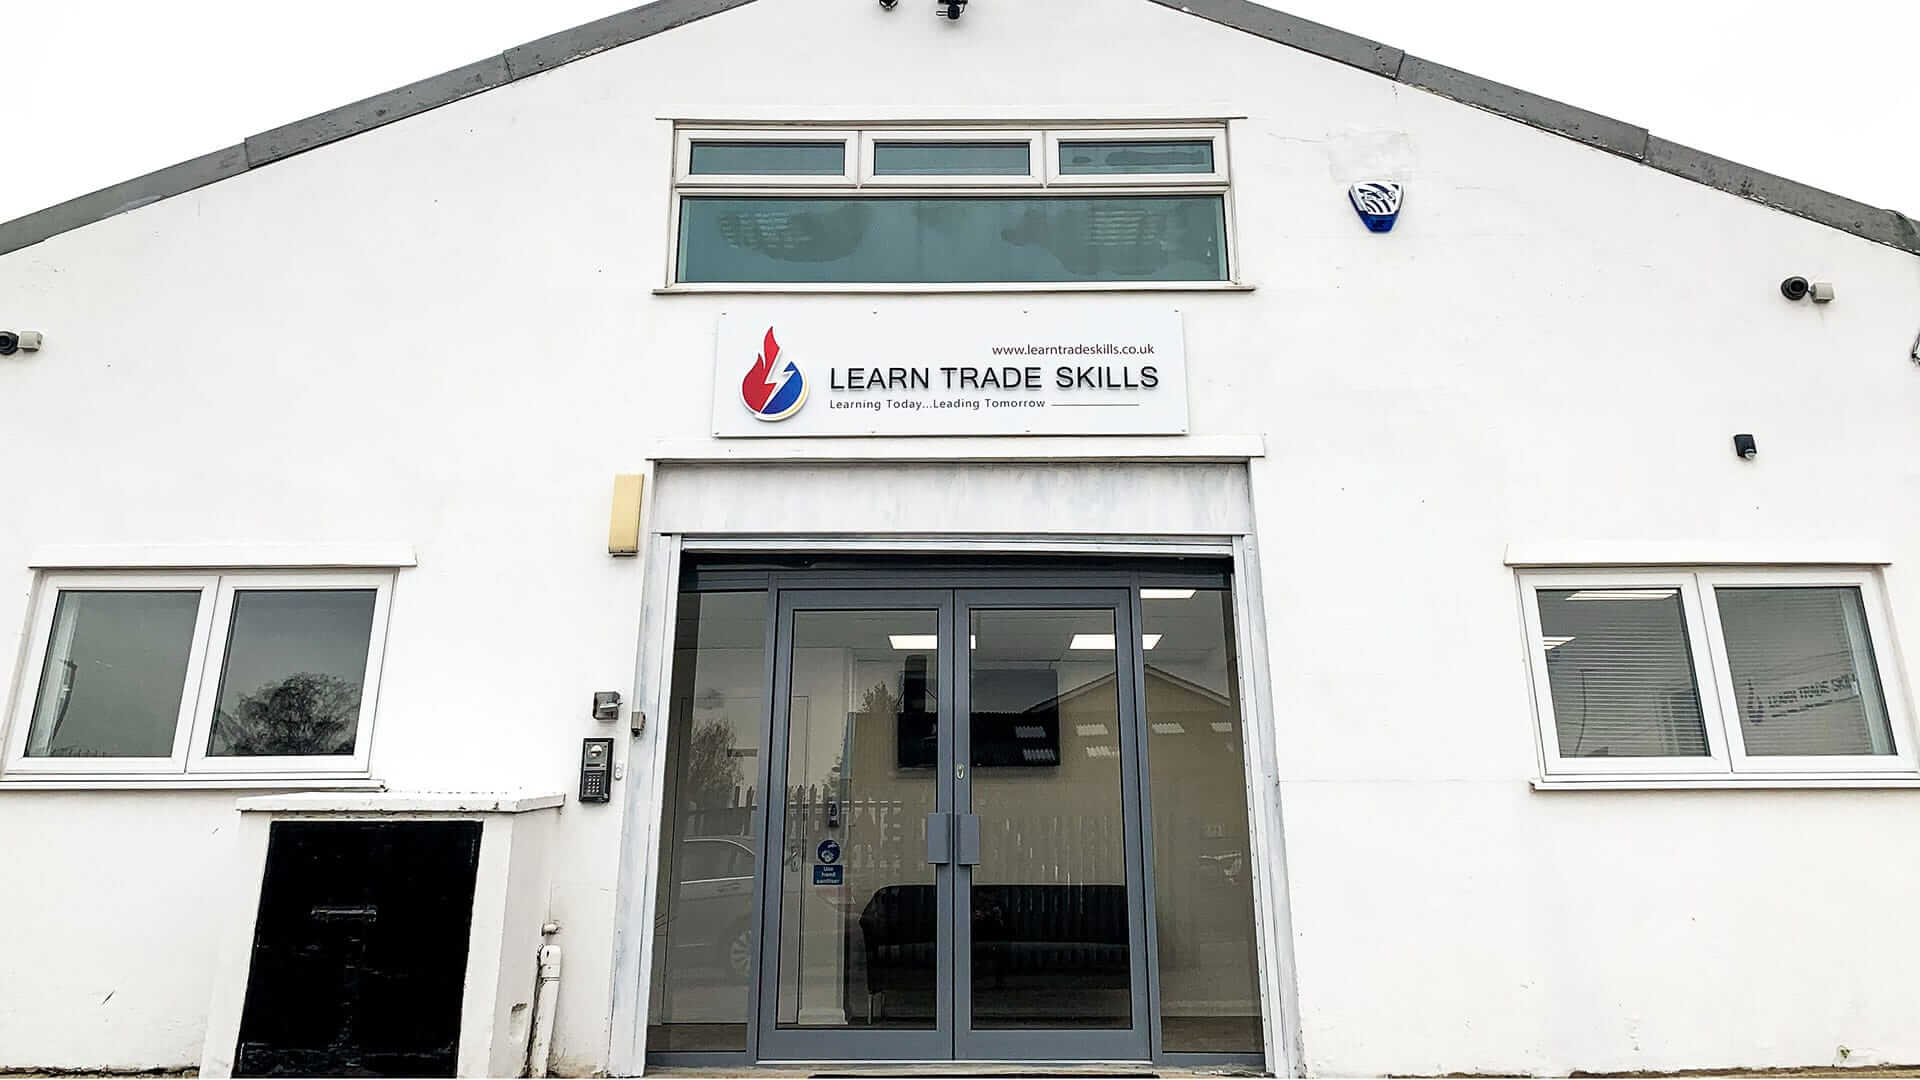 Learn Trade Skills